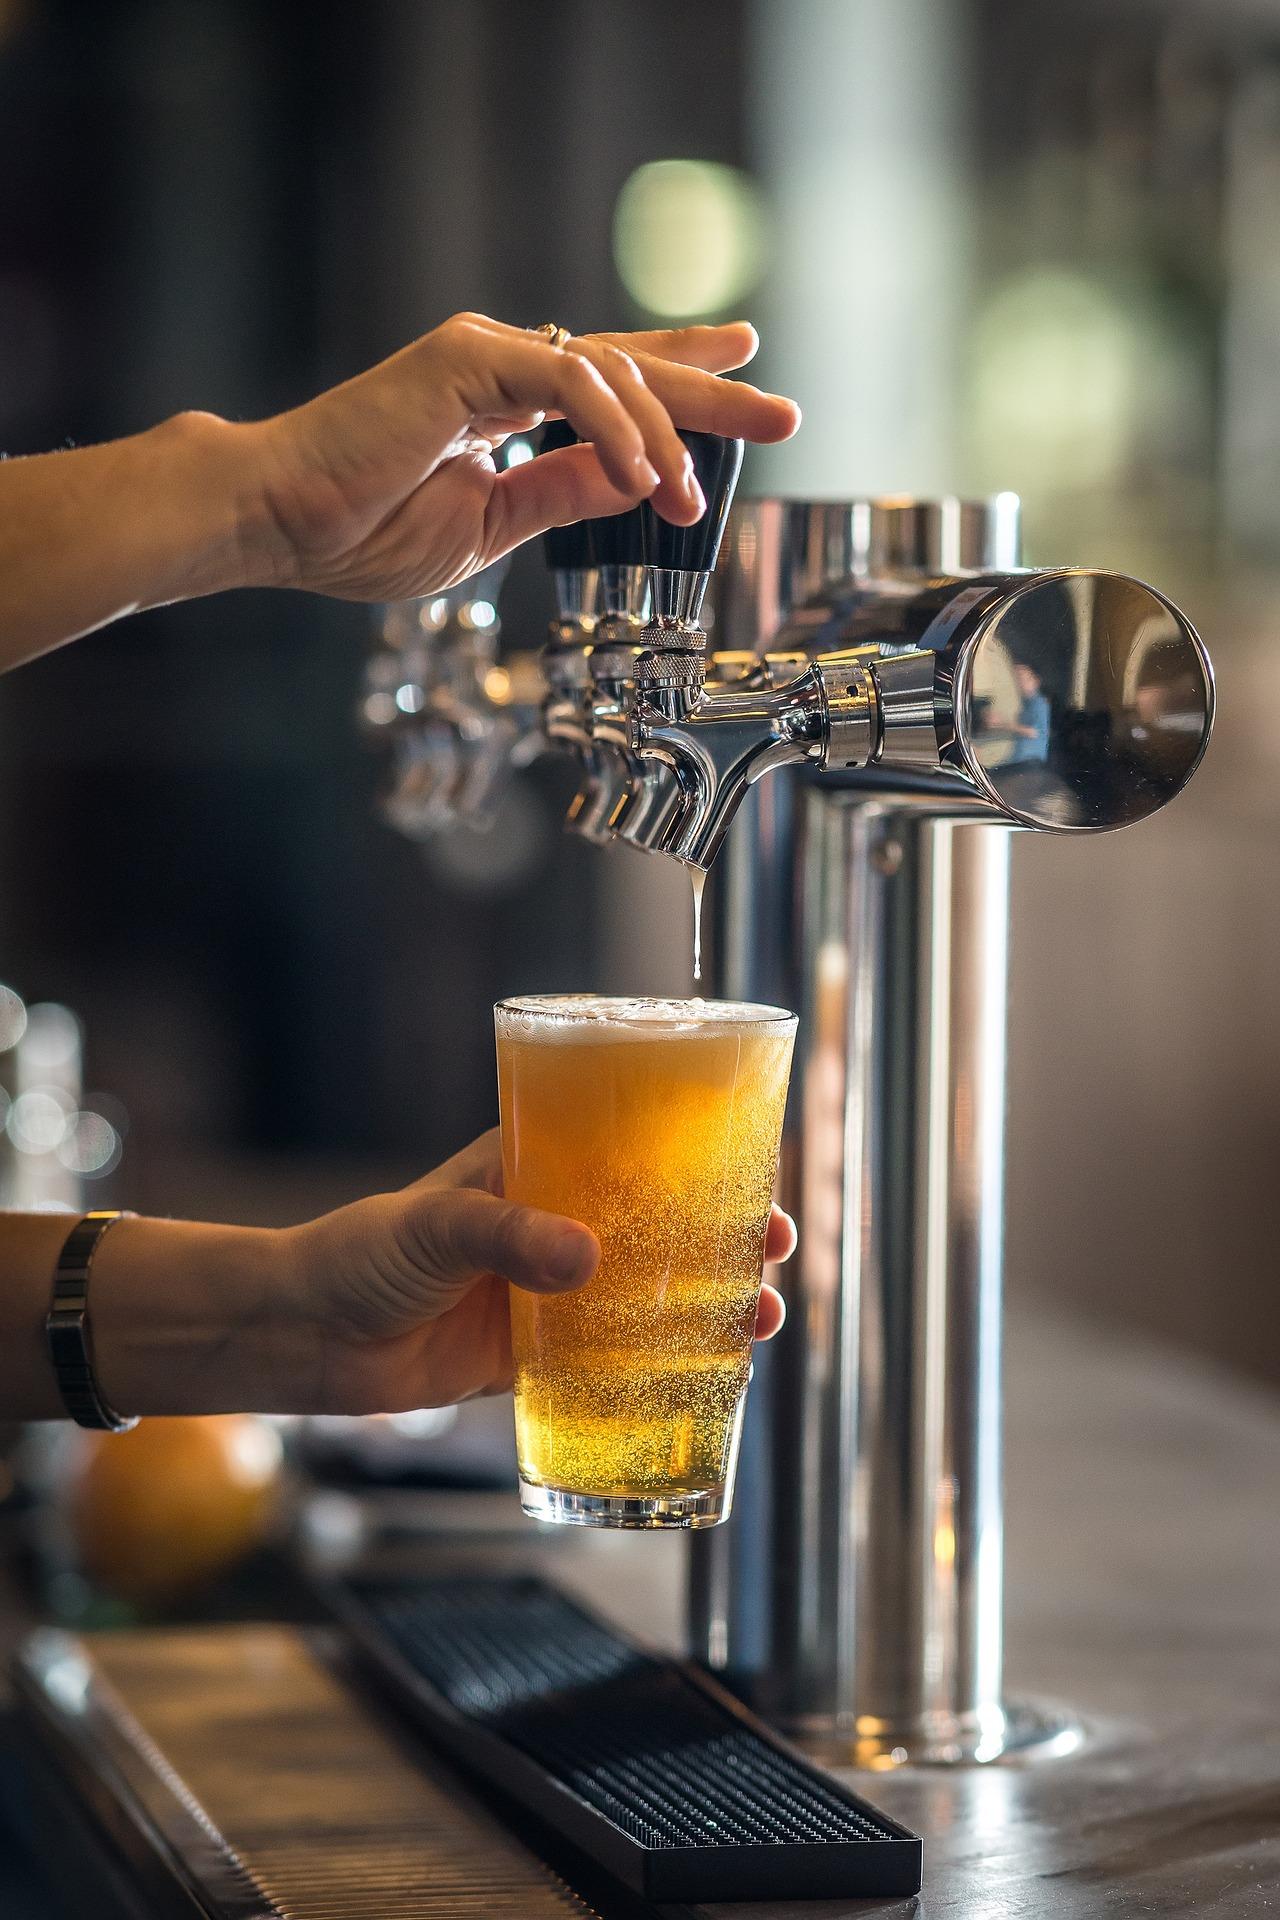 MaxPixel.freegreatpicture.com-Restaurant-Pouring-Refreshment-Bar-Beer-Pub-1218742.jpg